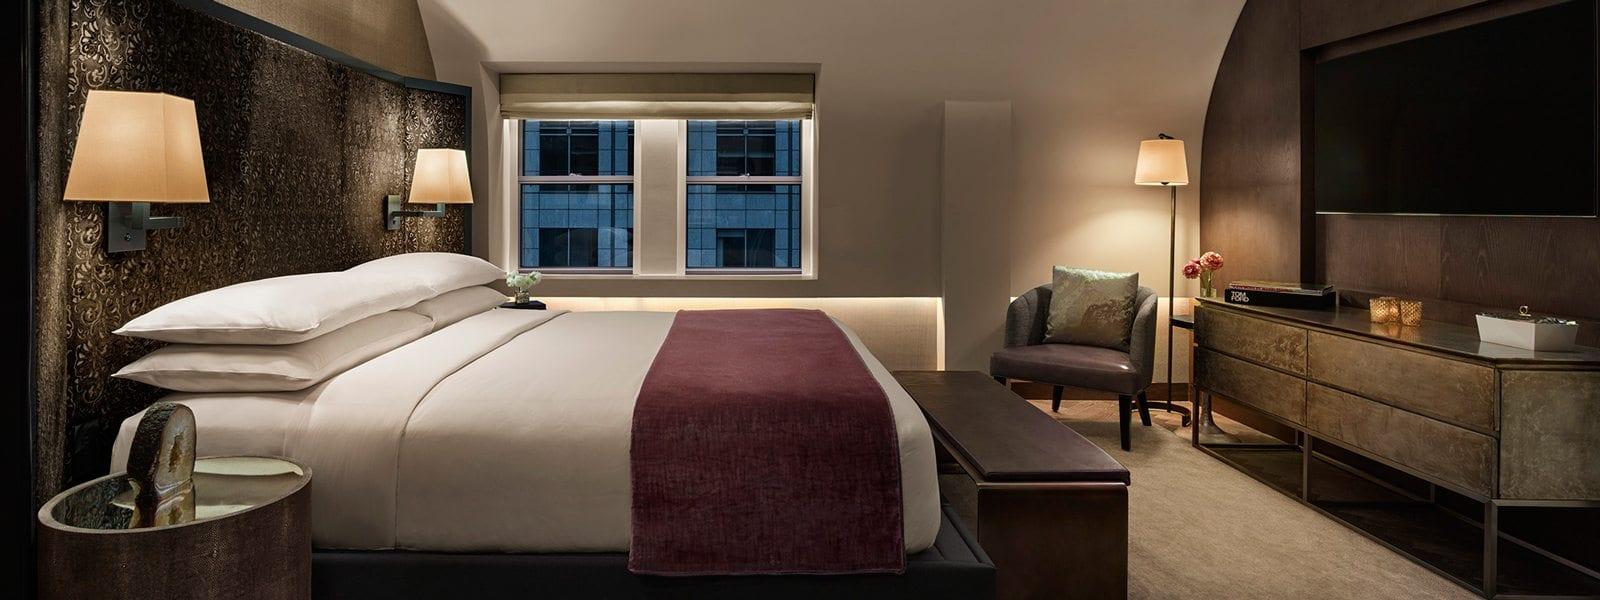 Luxury Hotel Rooms Amp Suites In Nyc The Knickerbocker Hotel